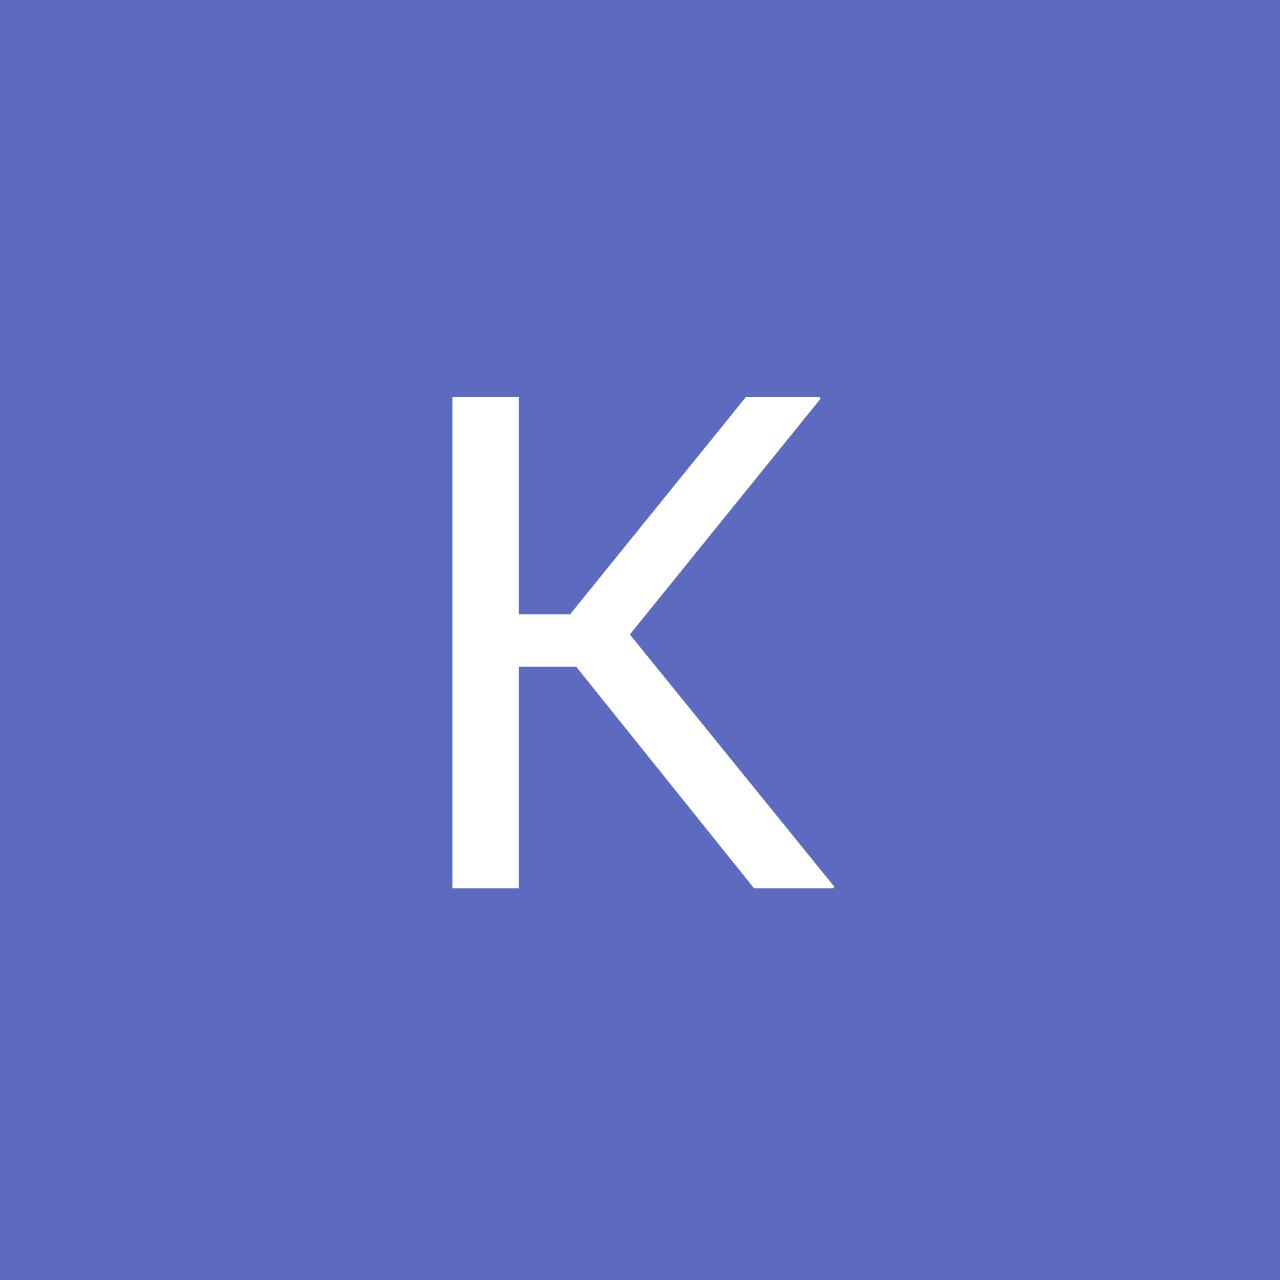 Kckyle456